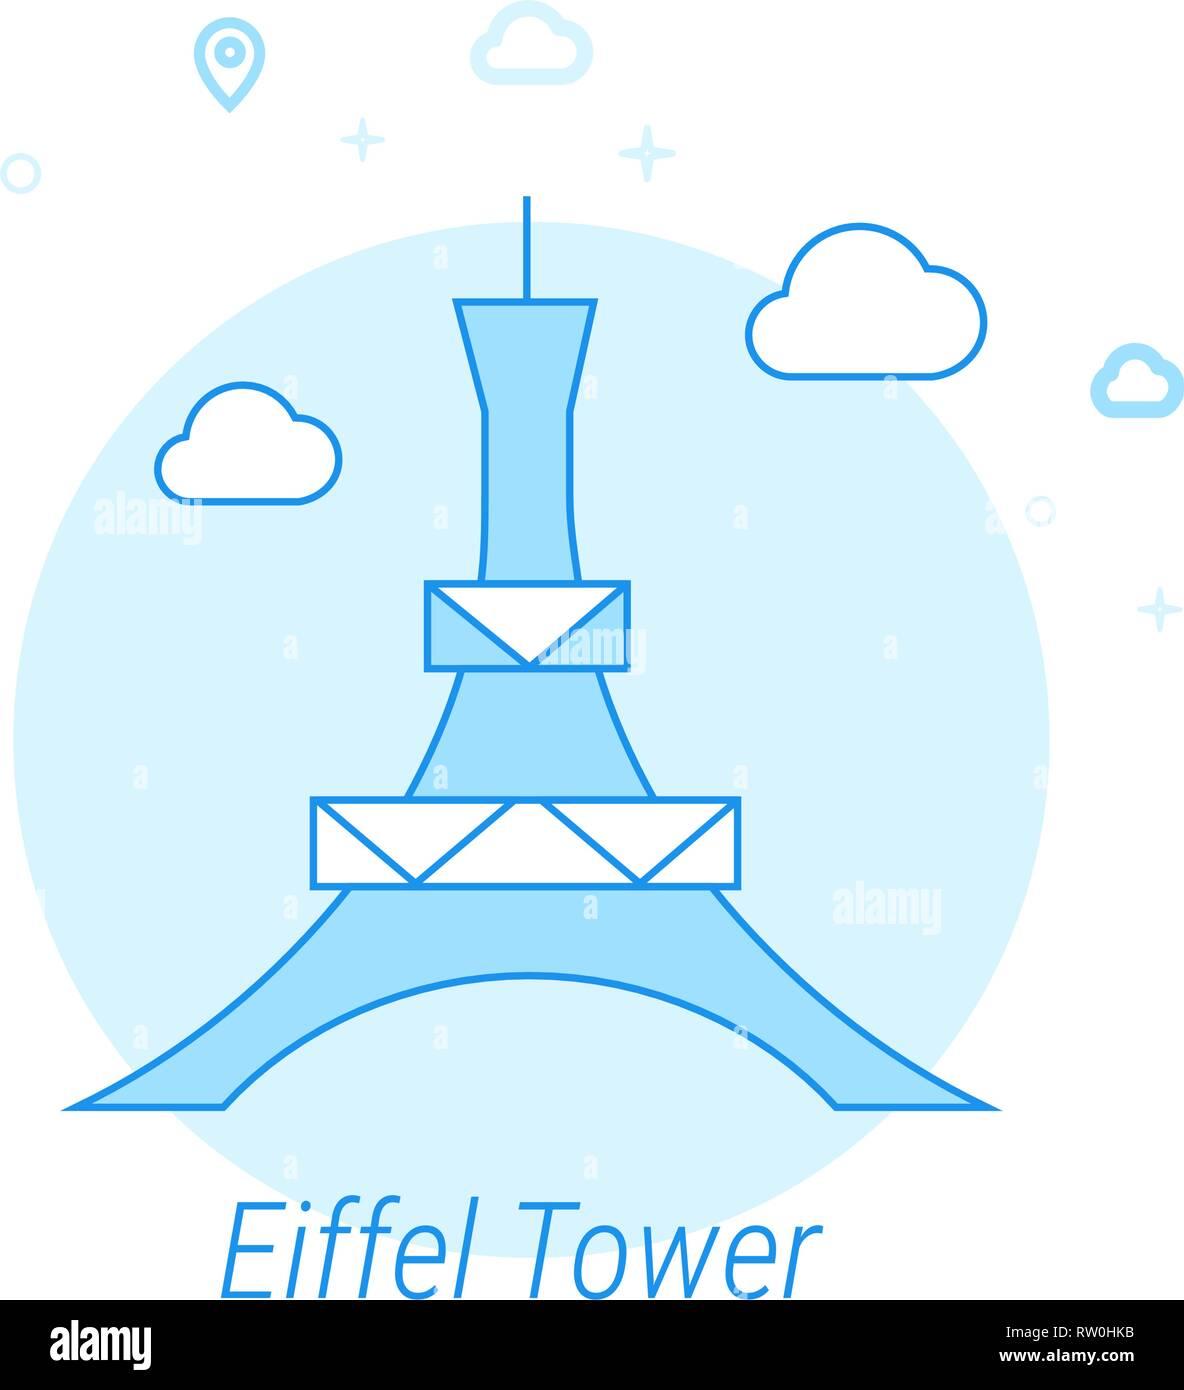 Eiffel Tower, Paris Flat Vector Icon. Historical Landmarks Related Illustration. Light Flat Style. Blue Monochrome Design. Editable Stroke. - Stock Vector